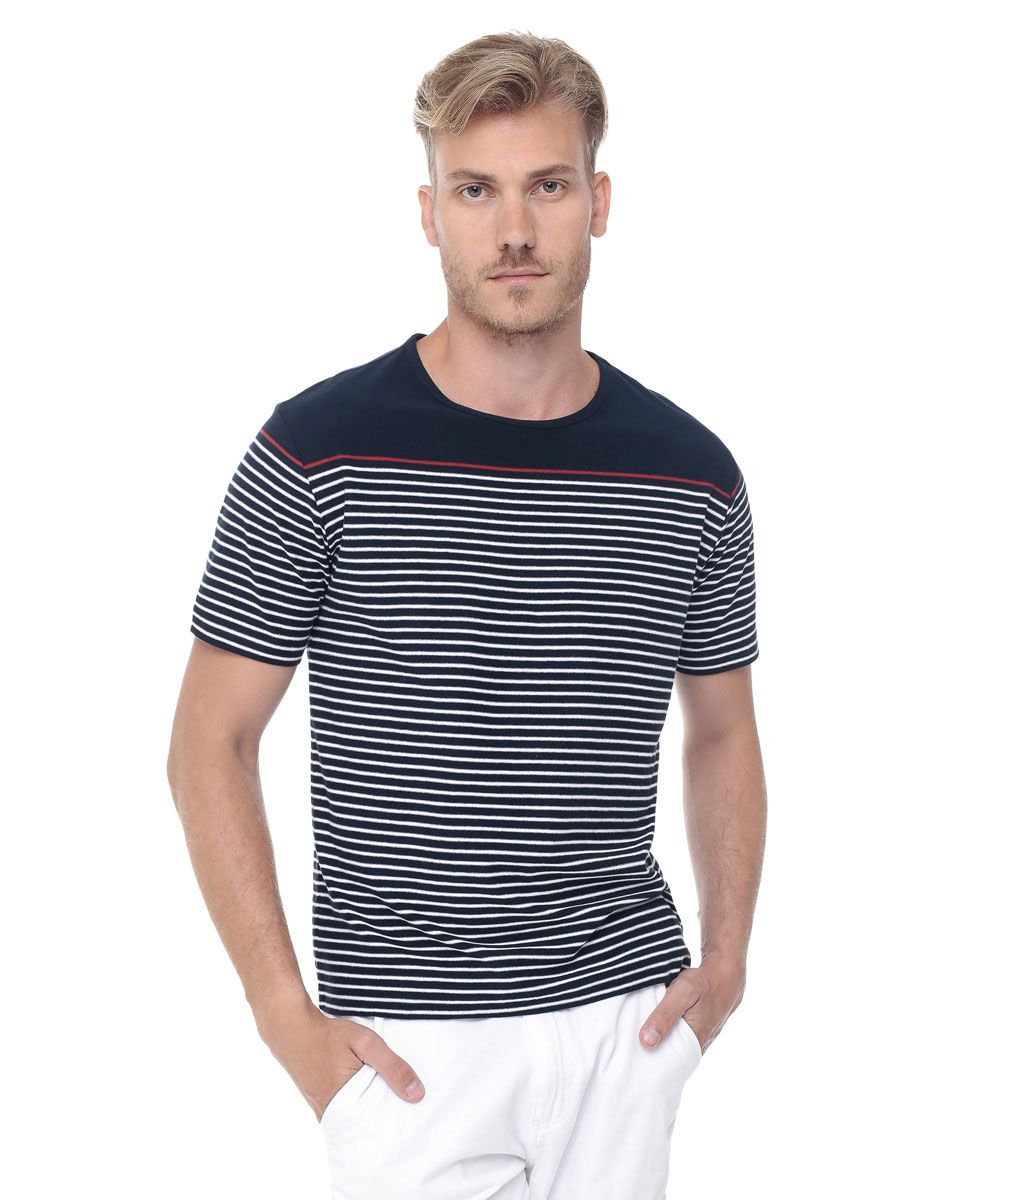 42051dcef6 Camiseta Masculina Listrada - Lojas Renner Camiseta Masculina Listrada